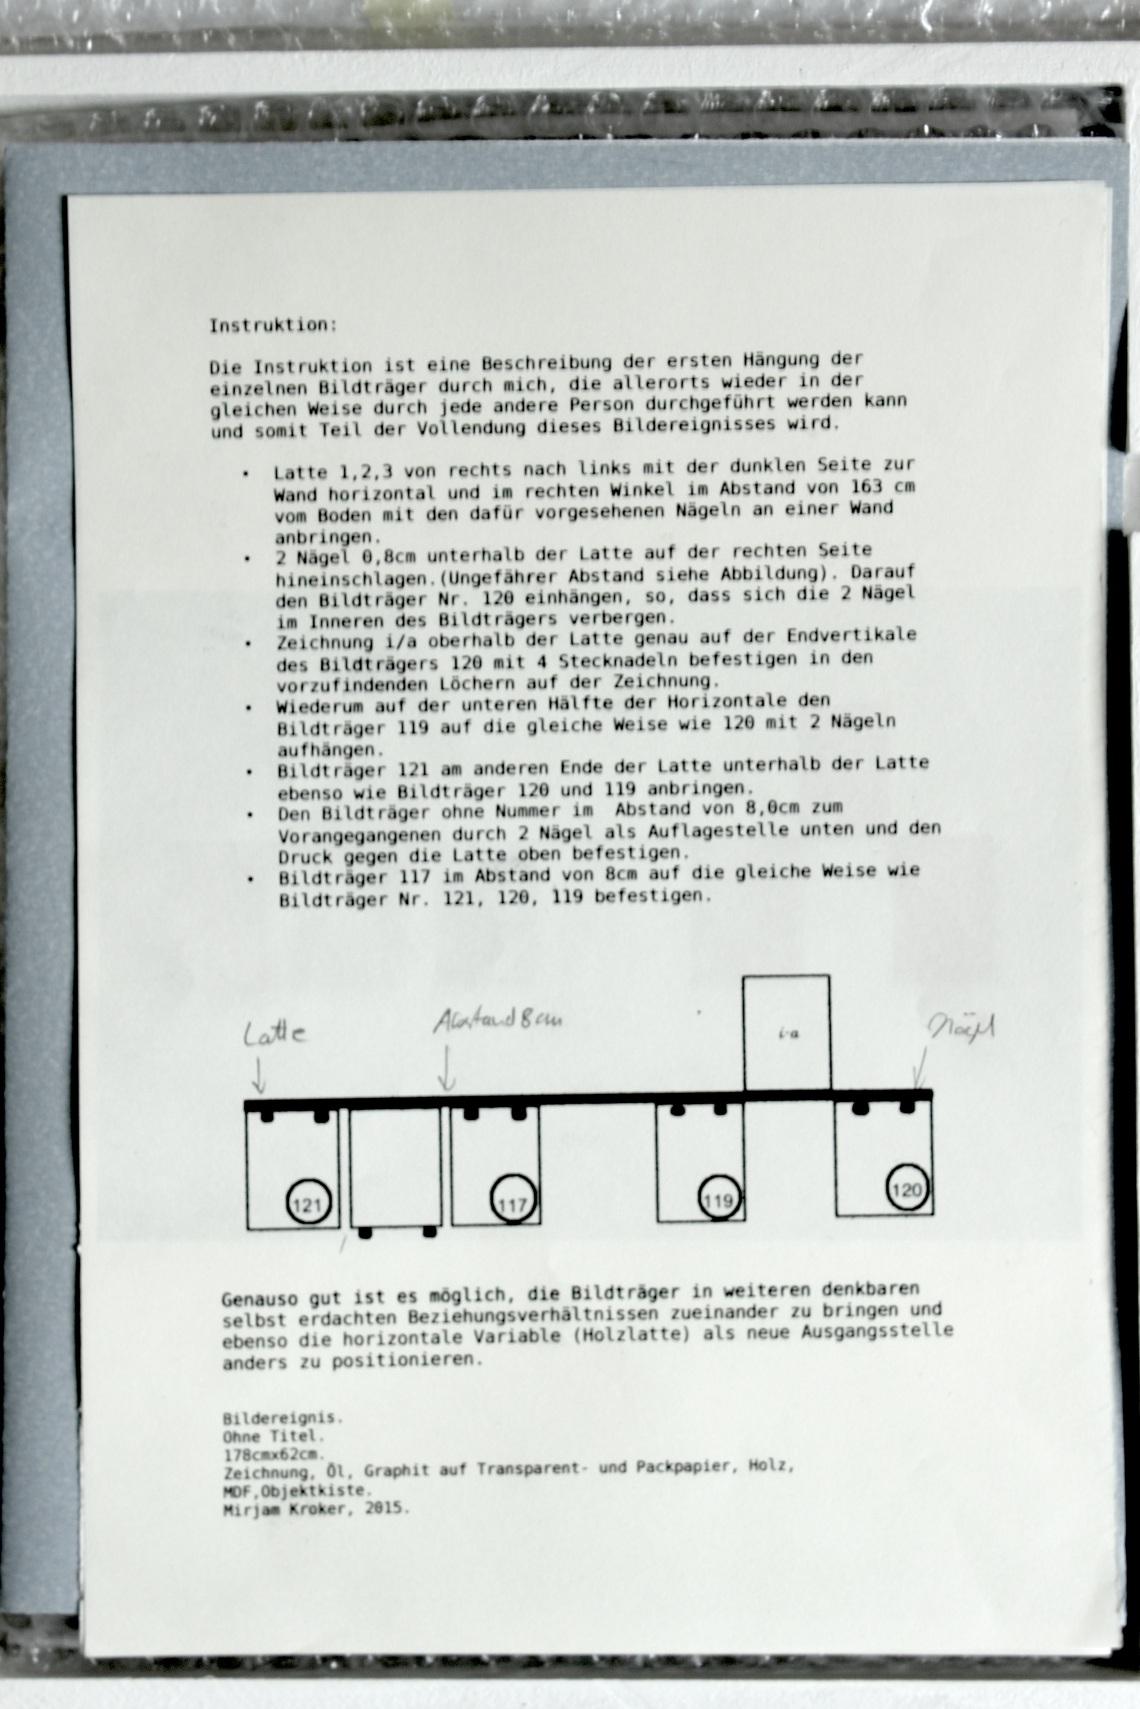 Instruktion, Ohne Titel,  Mirjam  Kroker,  2015